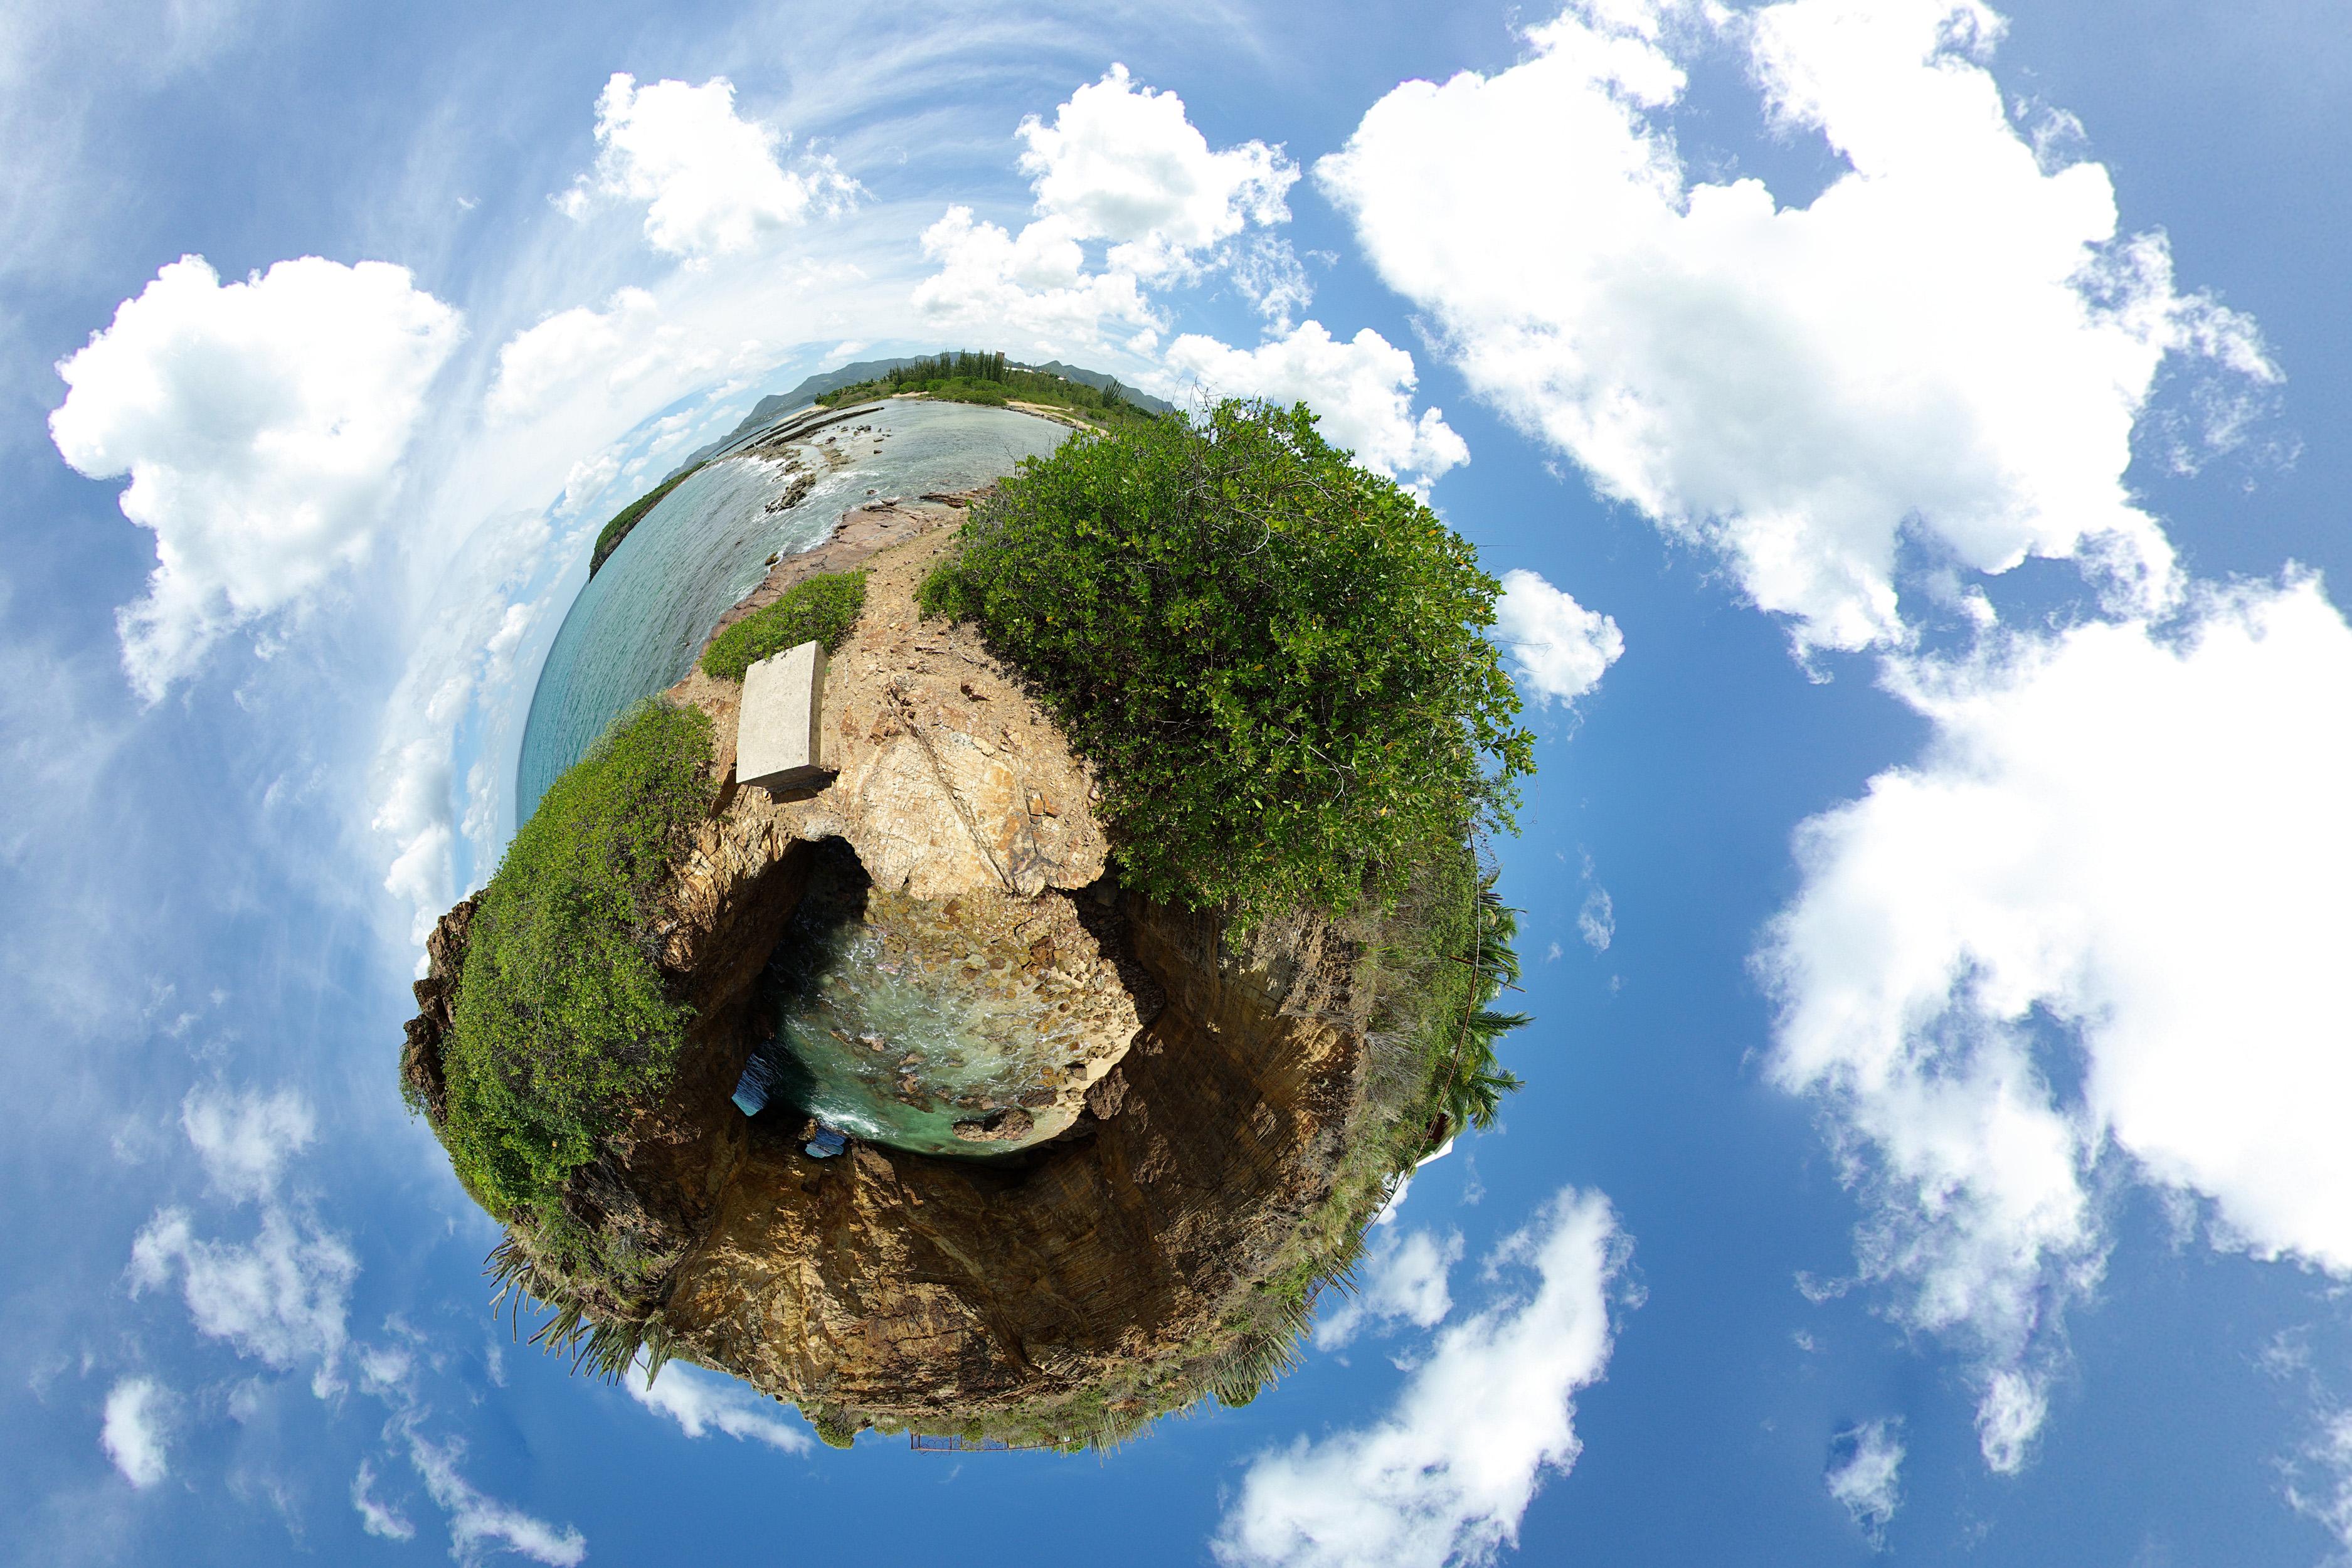 File:Globe panorama03.jpg - Wikipedia